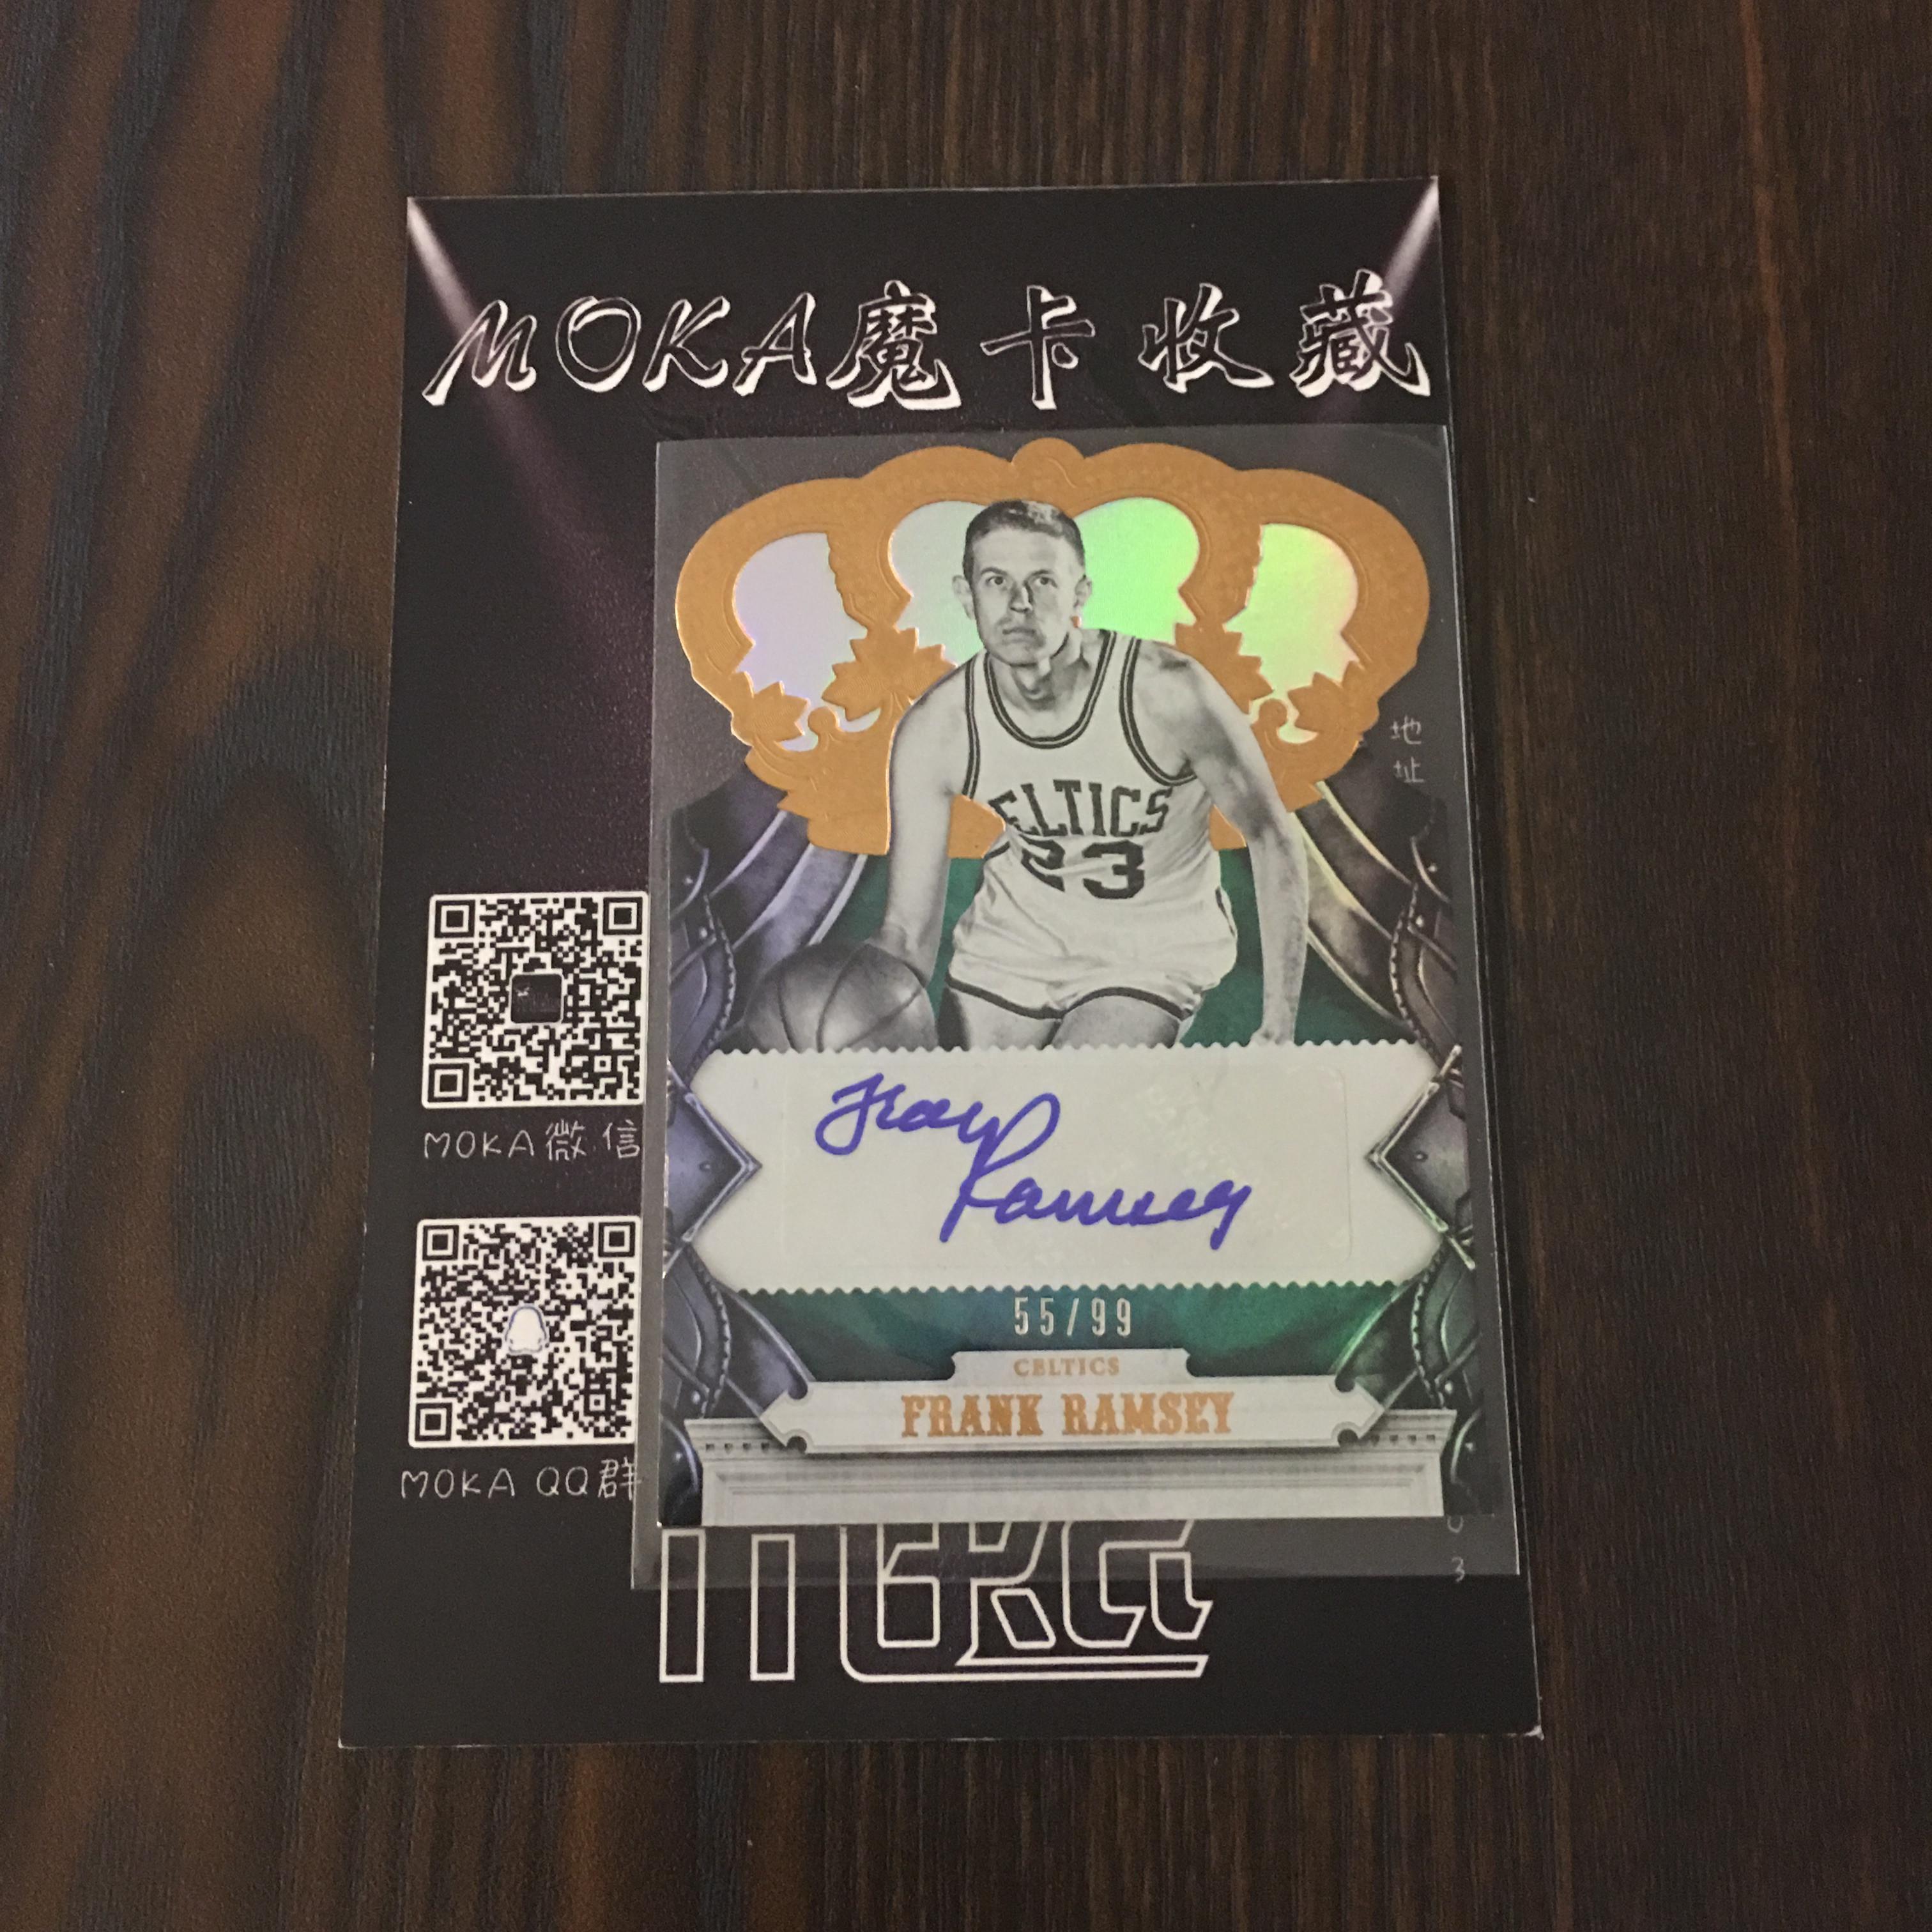 【MOKA球星卡收藏】#1804481 2017-18 Panini Crown 皇冠 签字 凯尔特人 拉姆塞 /99编